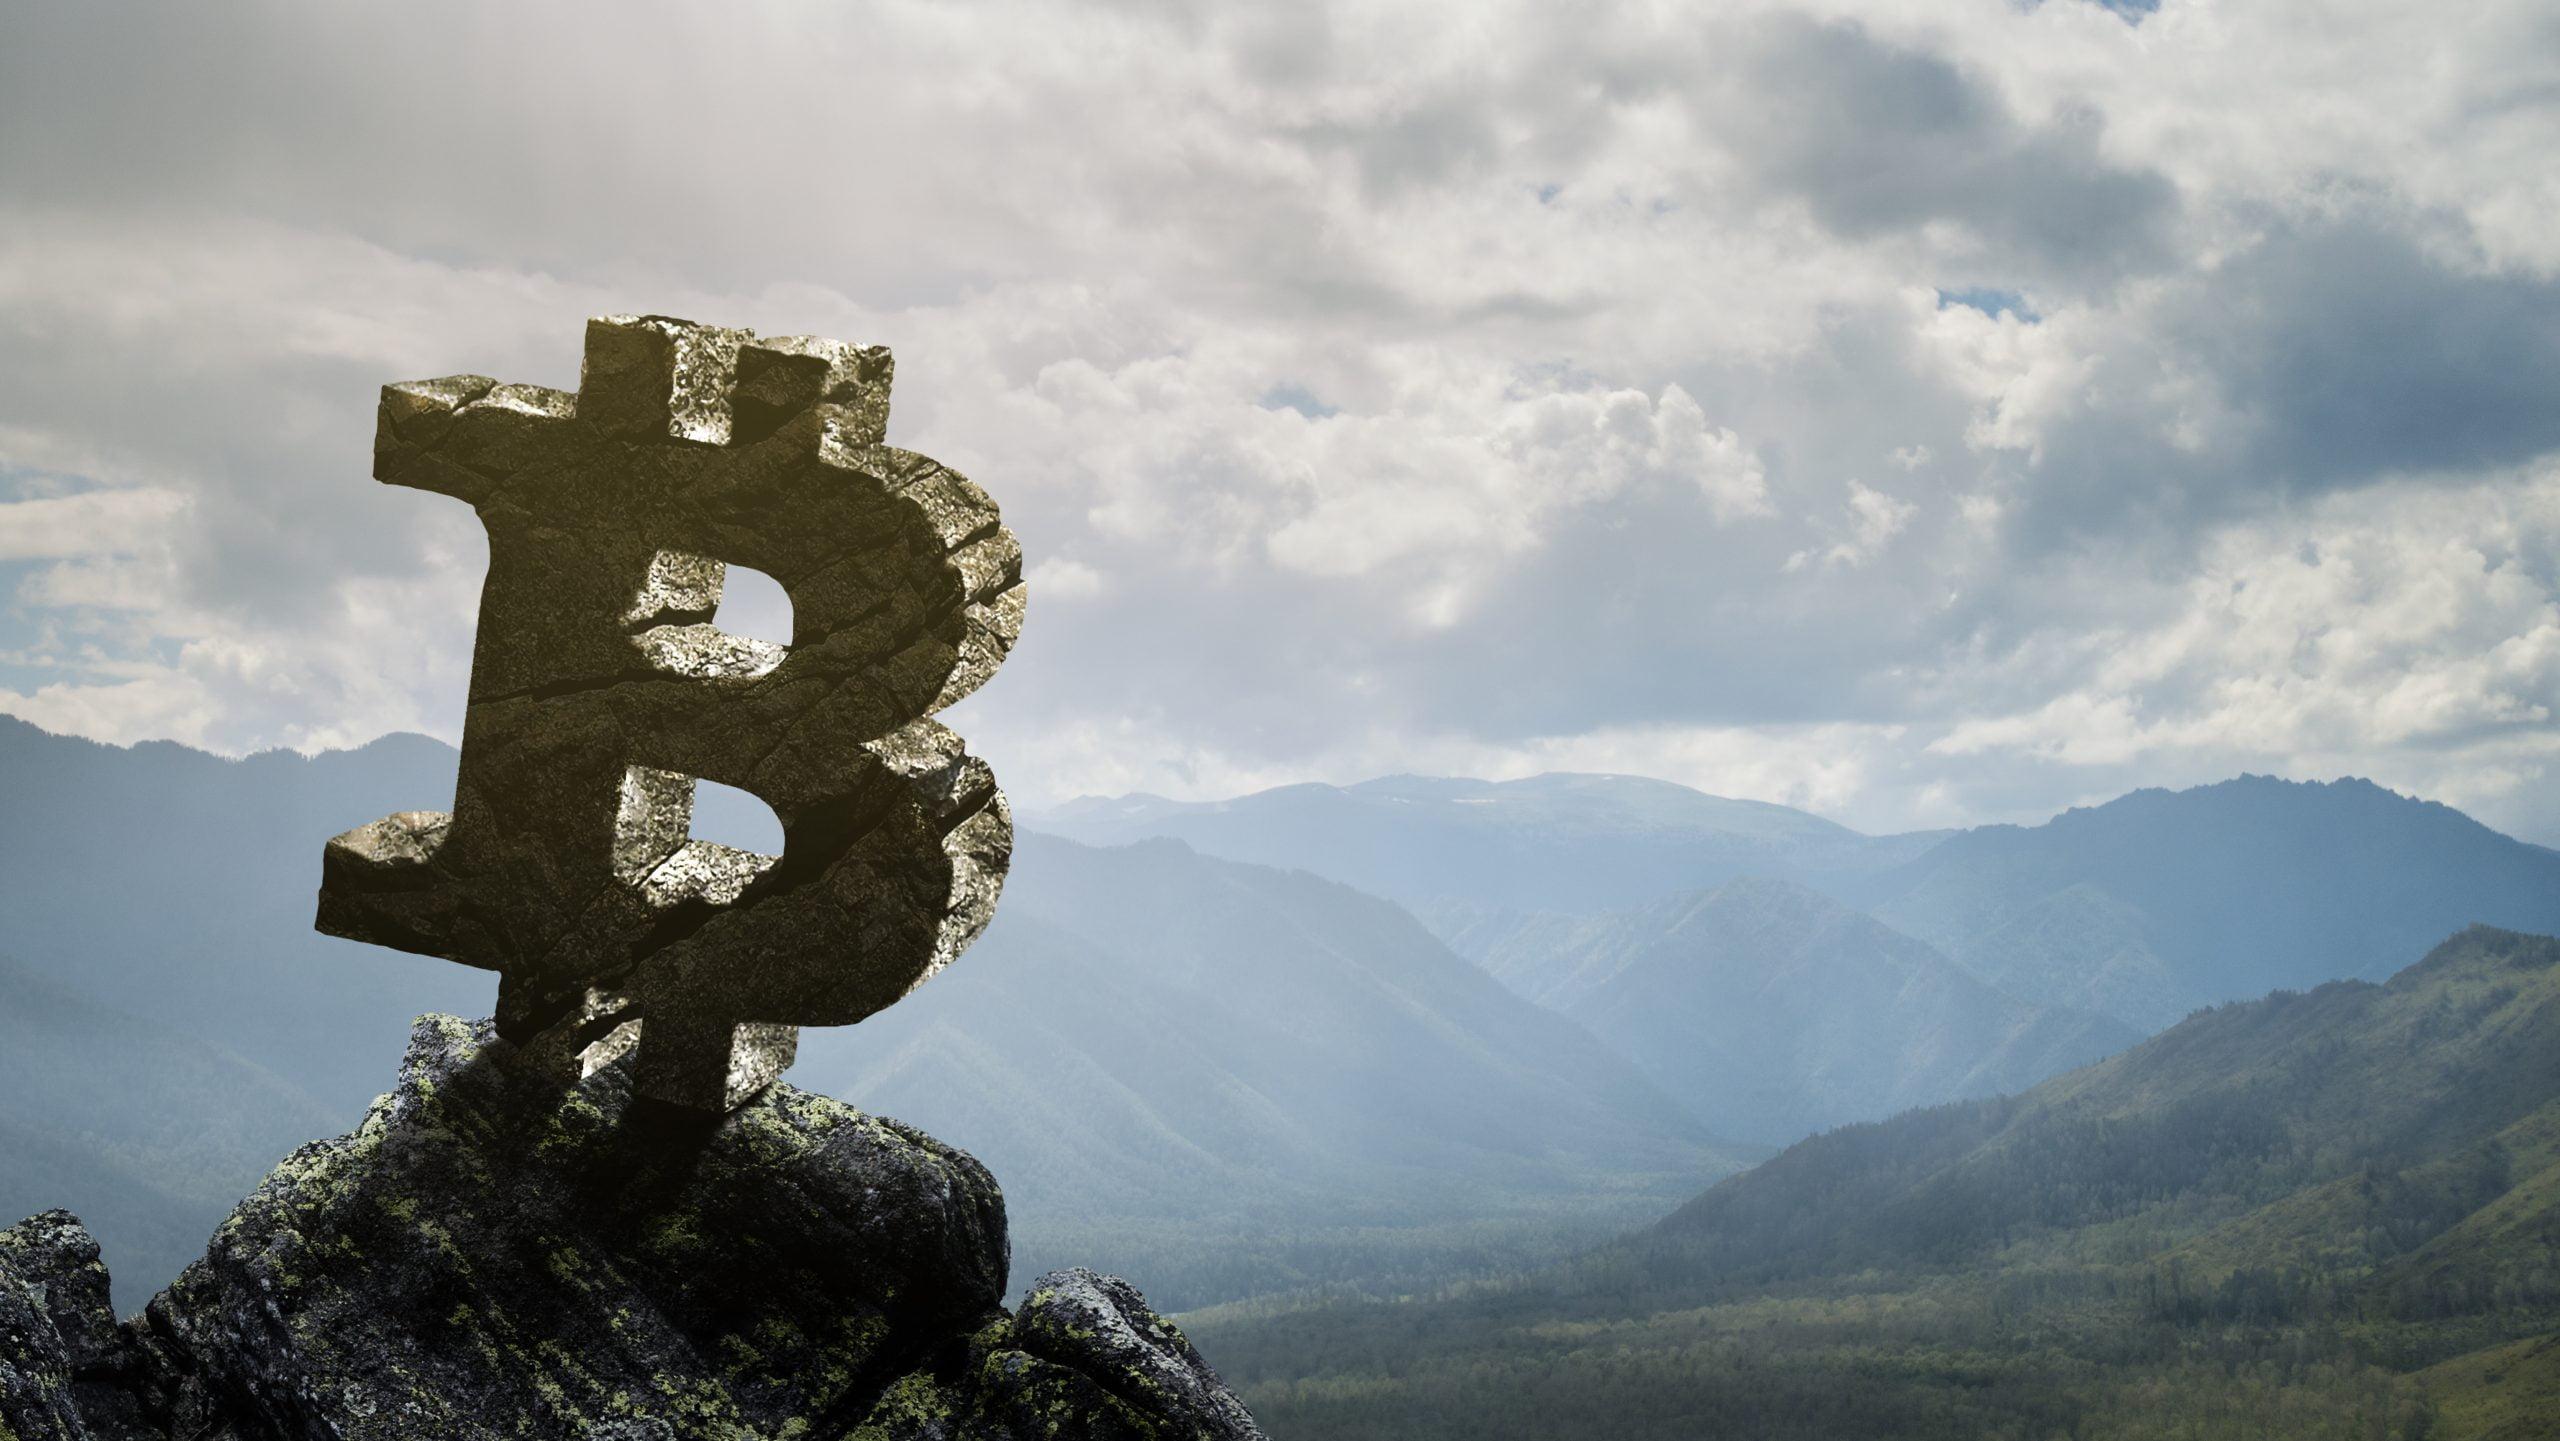 teknik analiz sirketi northstar badchartsin kurucu ortagi yil sonu bitcoin btc fiyat hedefini acikladi